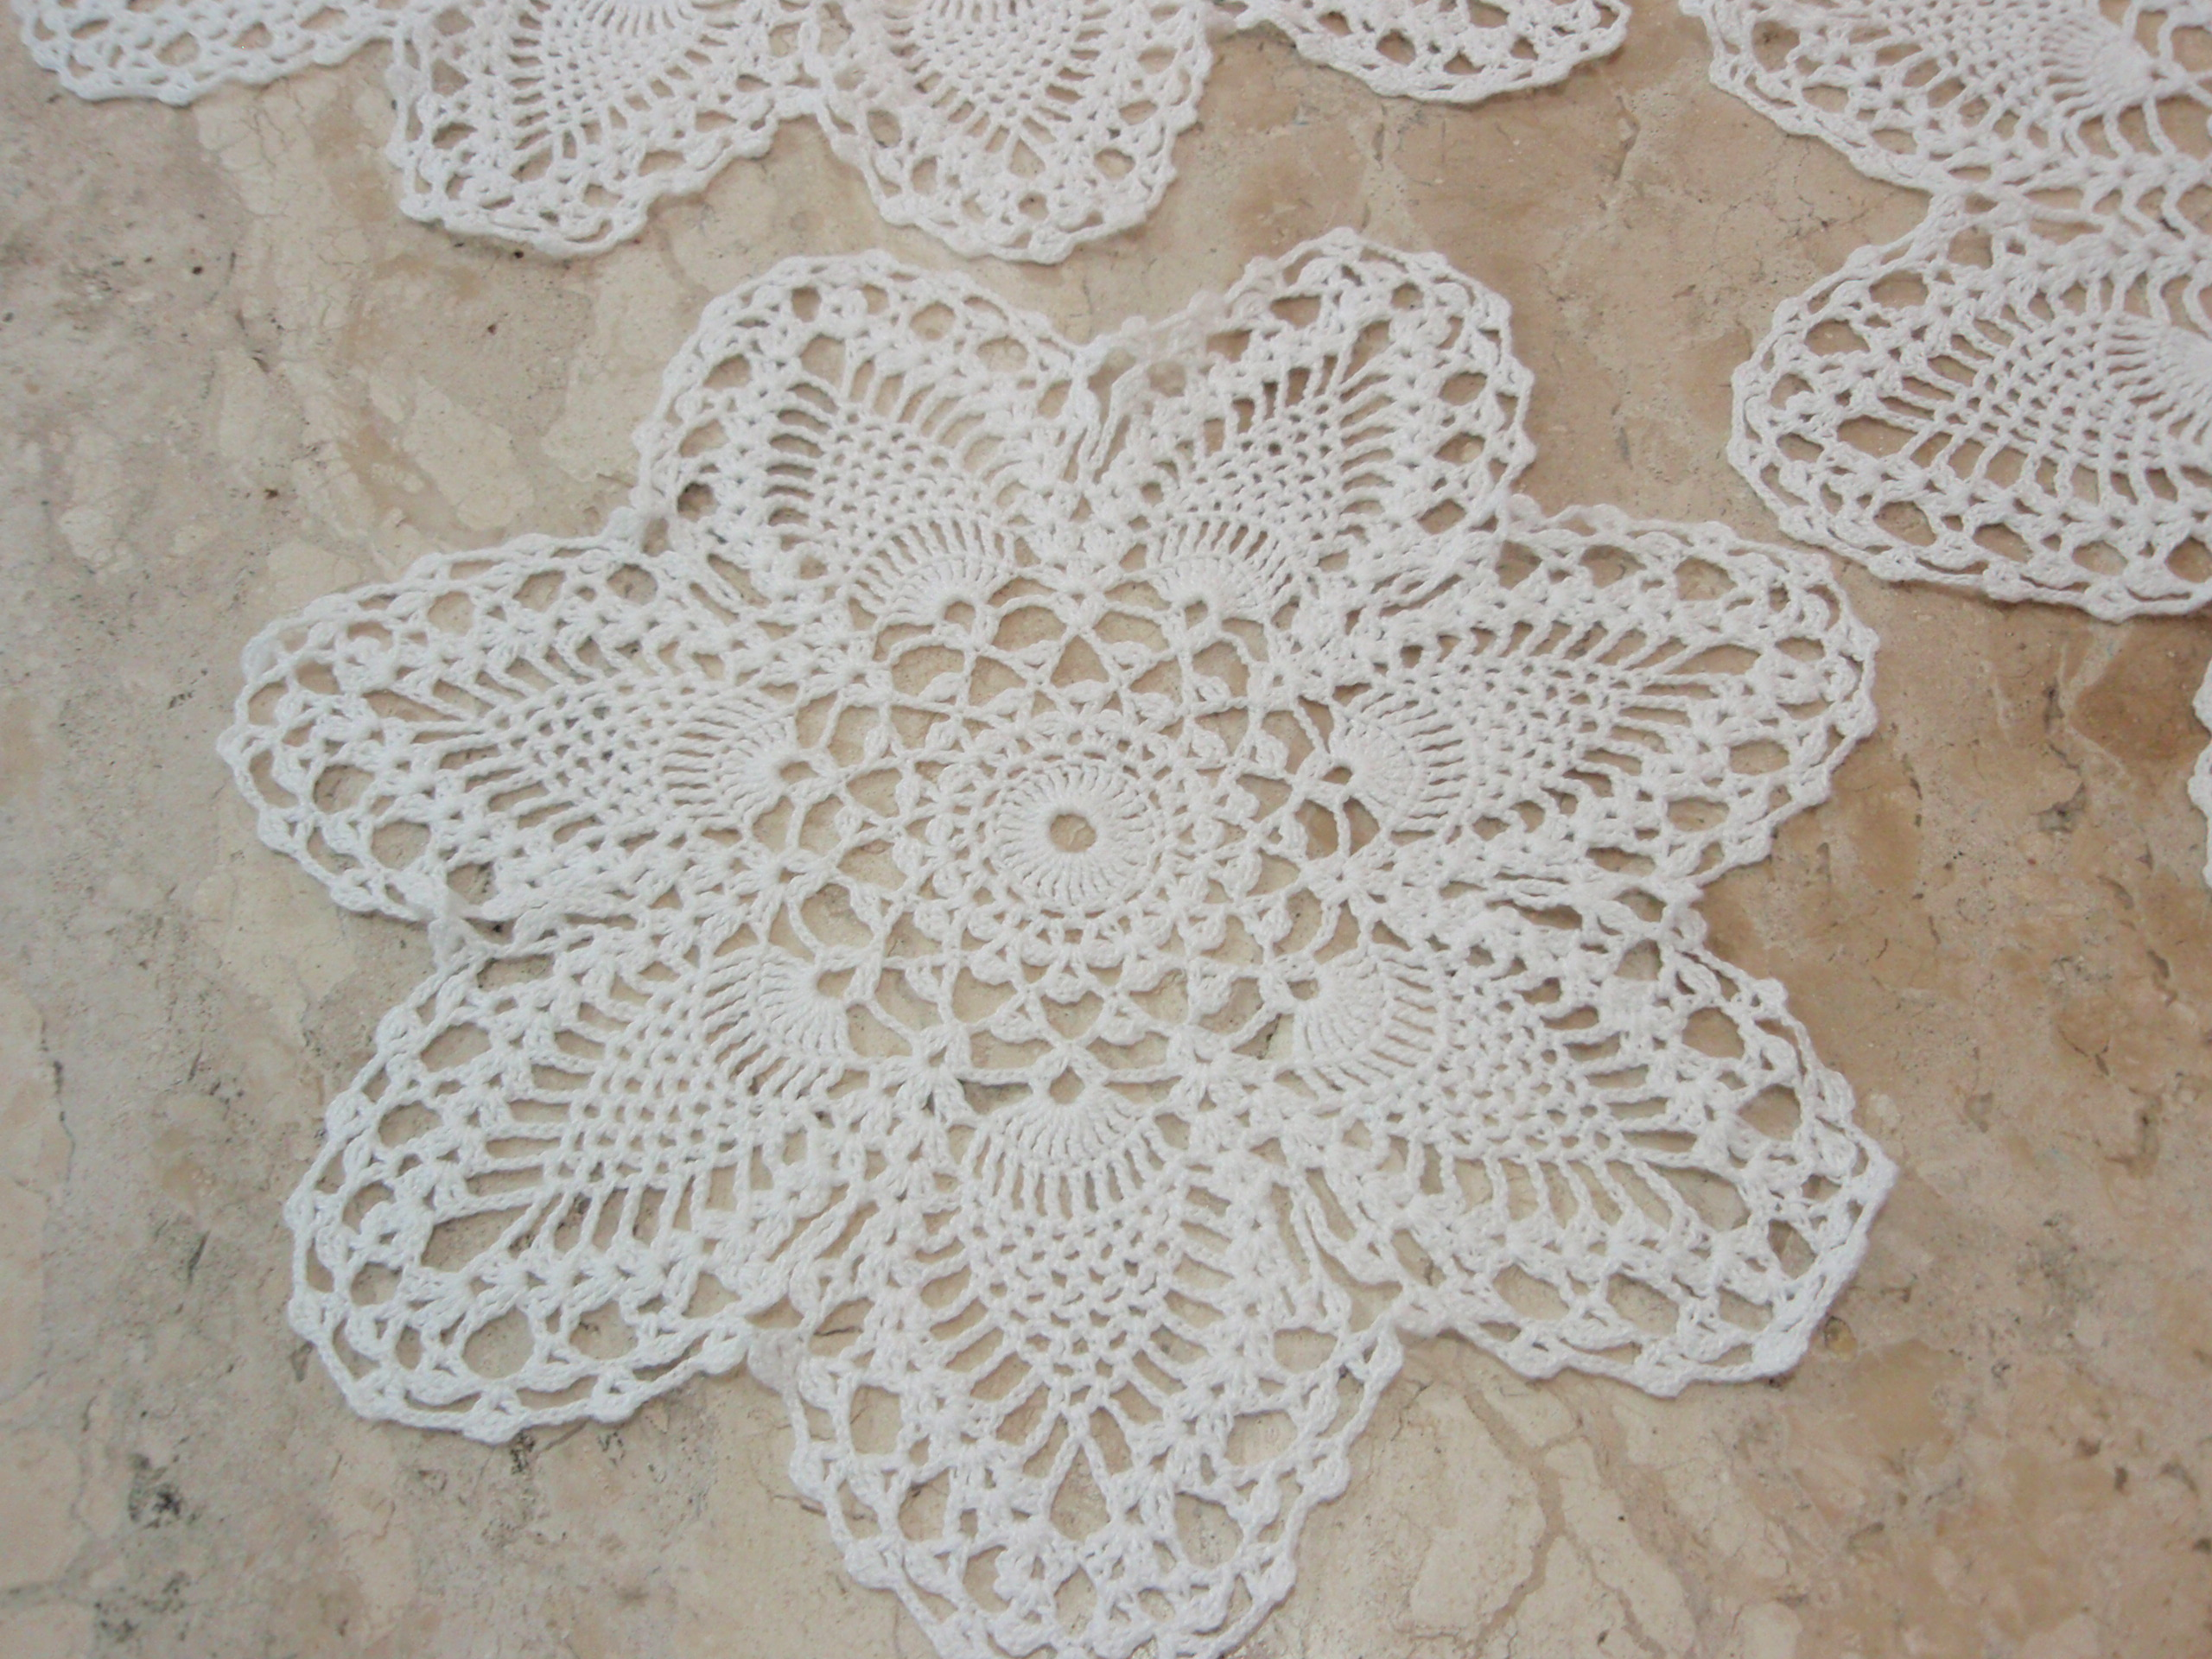 Toalhinhas De Croche Para Cozinha 11 Pictures to pin on Pinterest